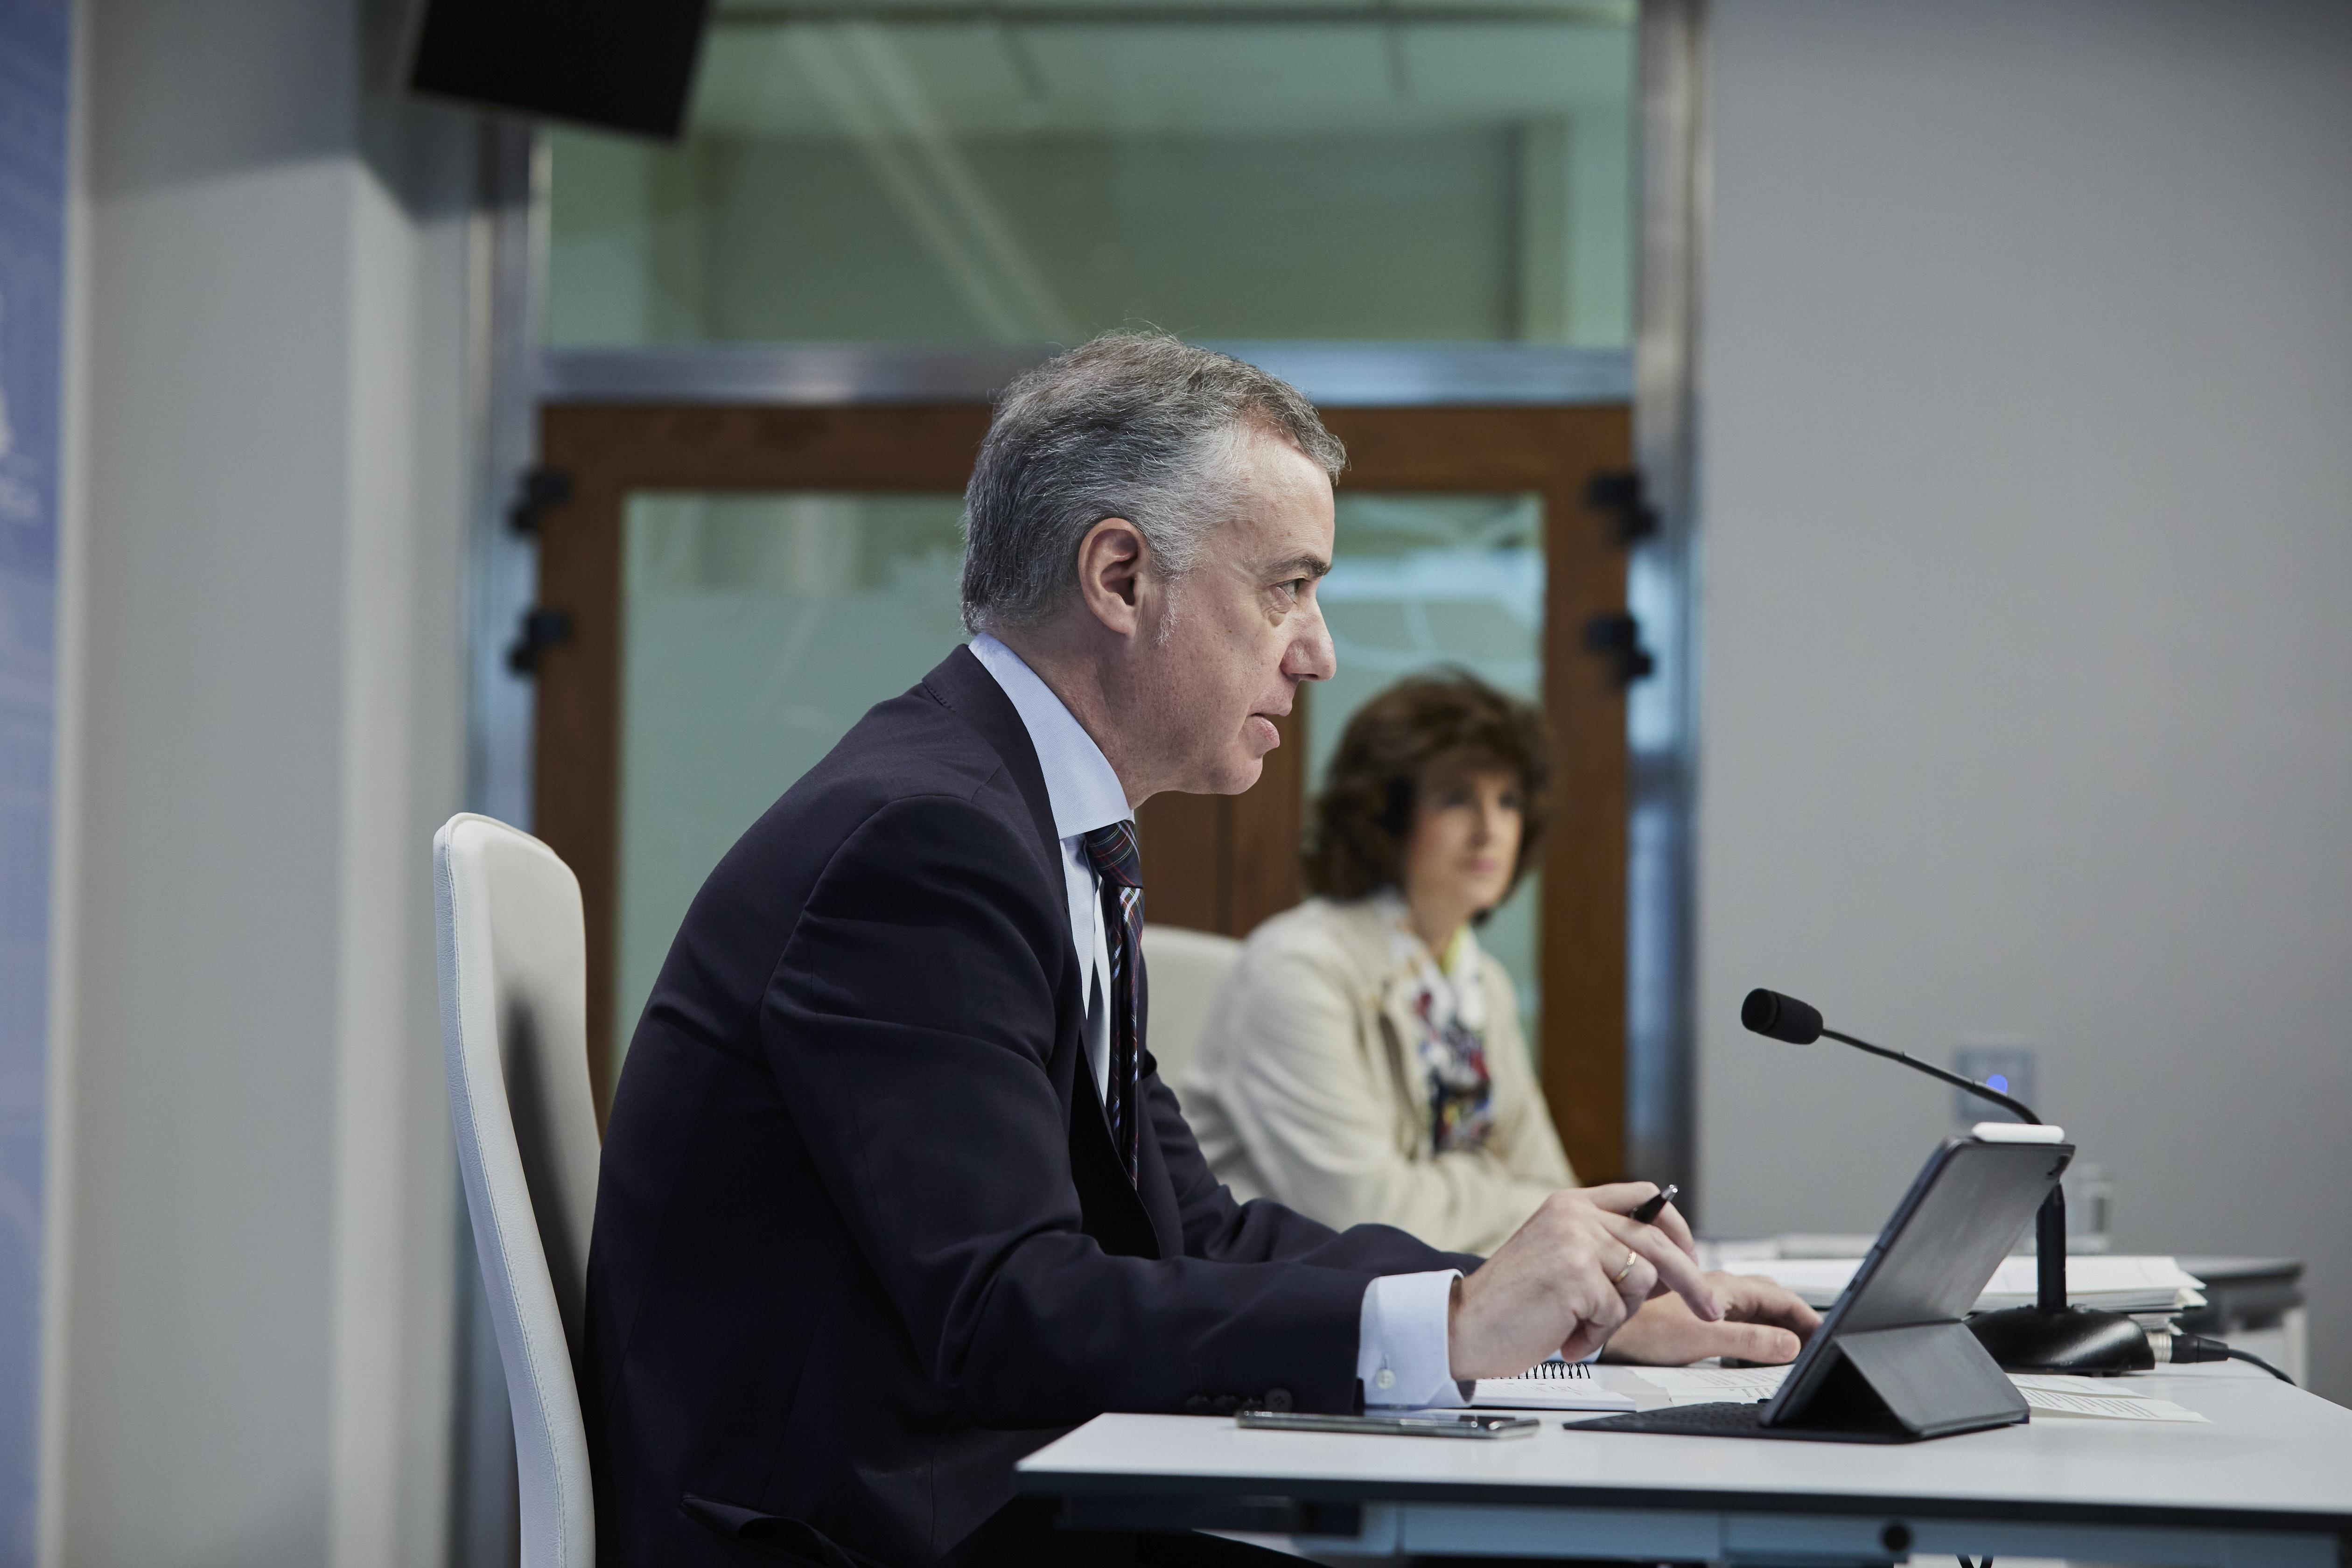 2020.04.12_Conferencia_Presidentes_010.jpg